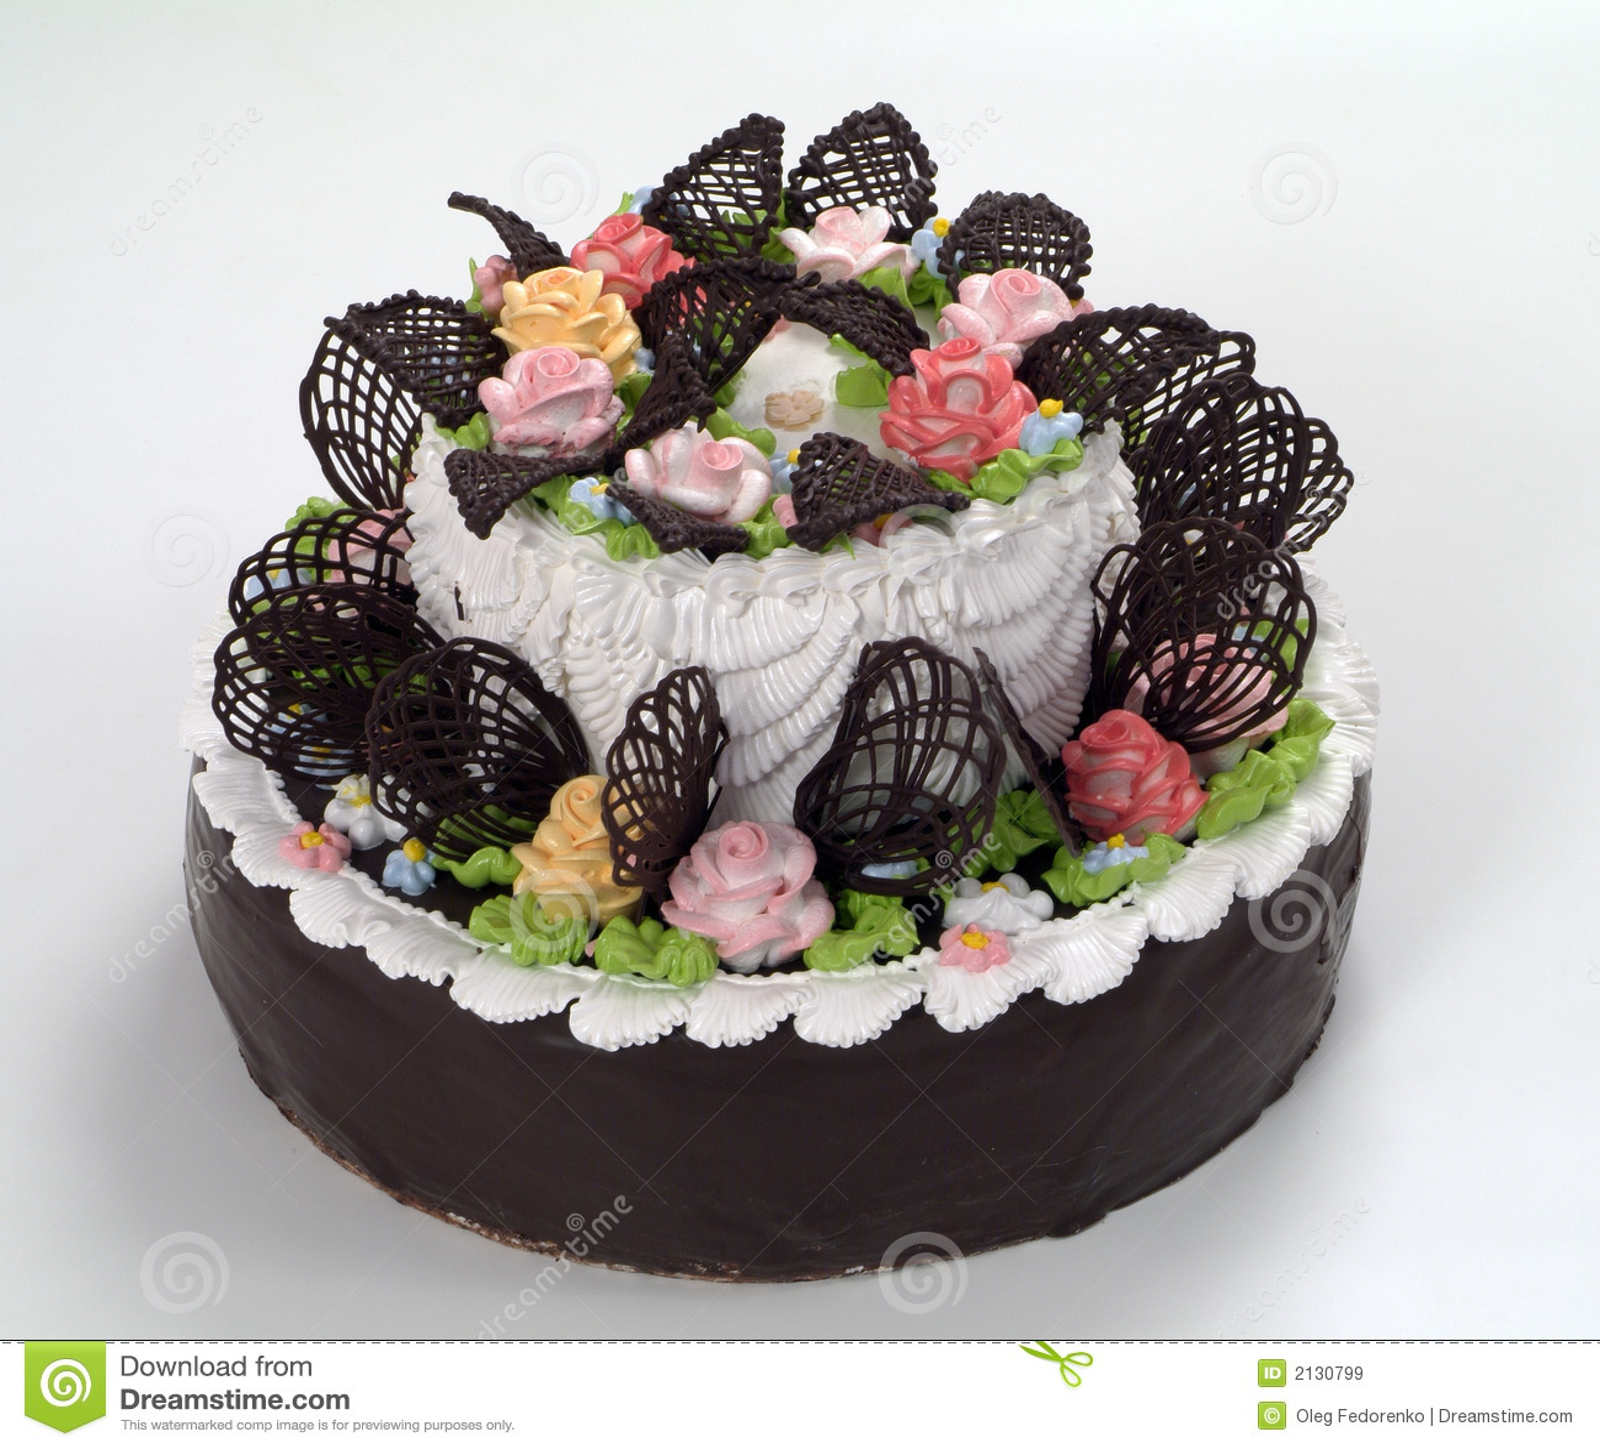 Pastries Cake Tasty Sweet Stock Image